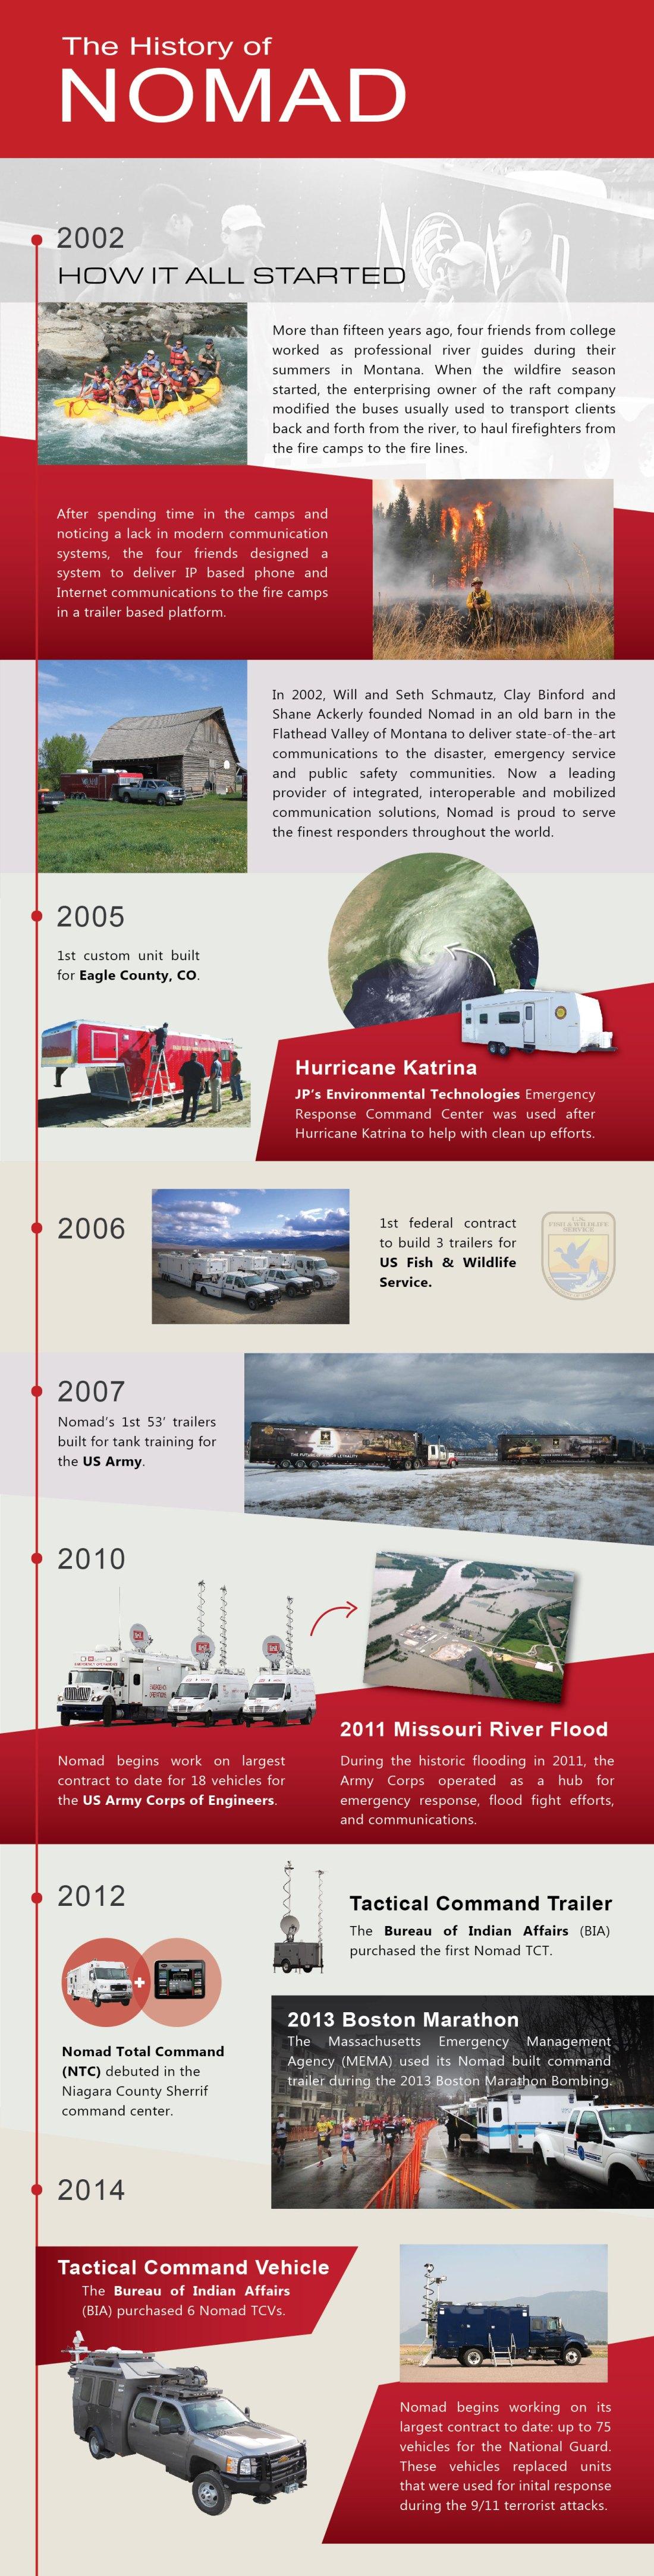 Nomad History